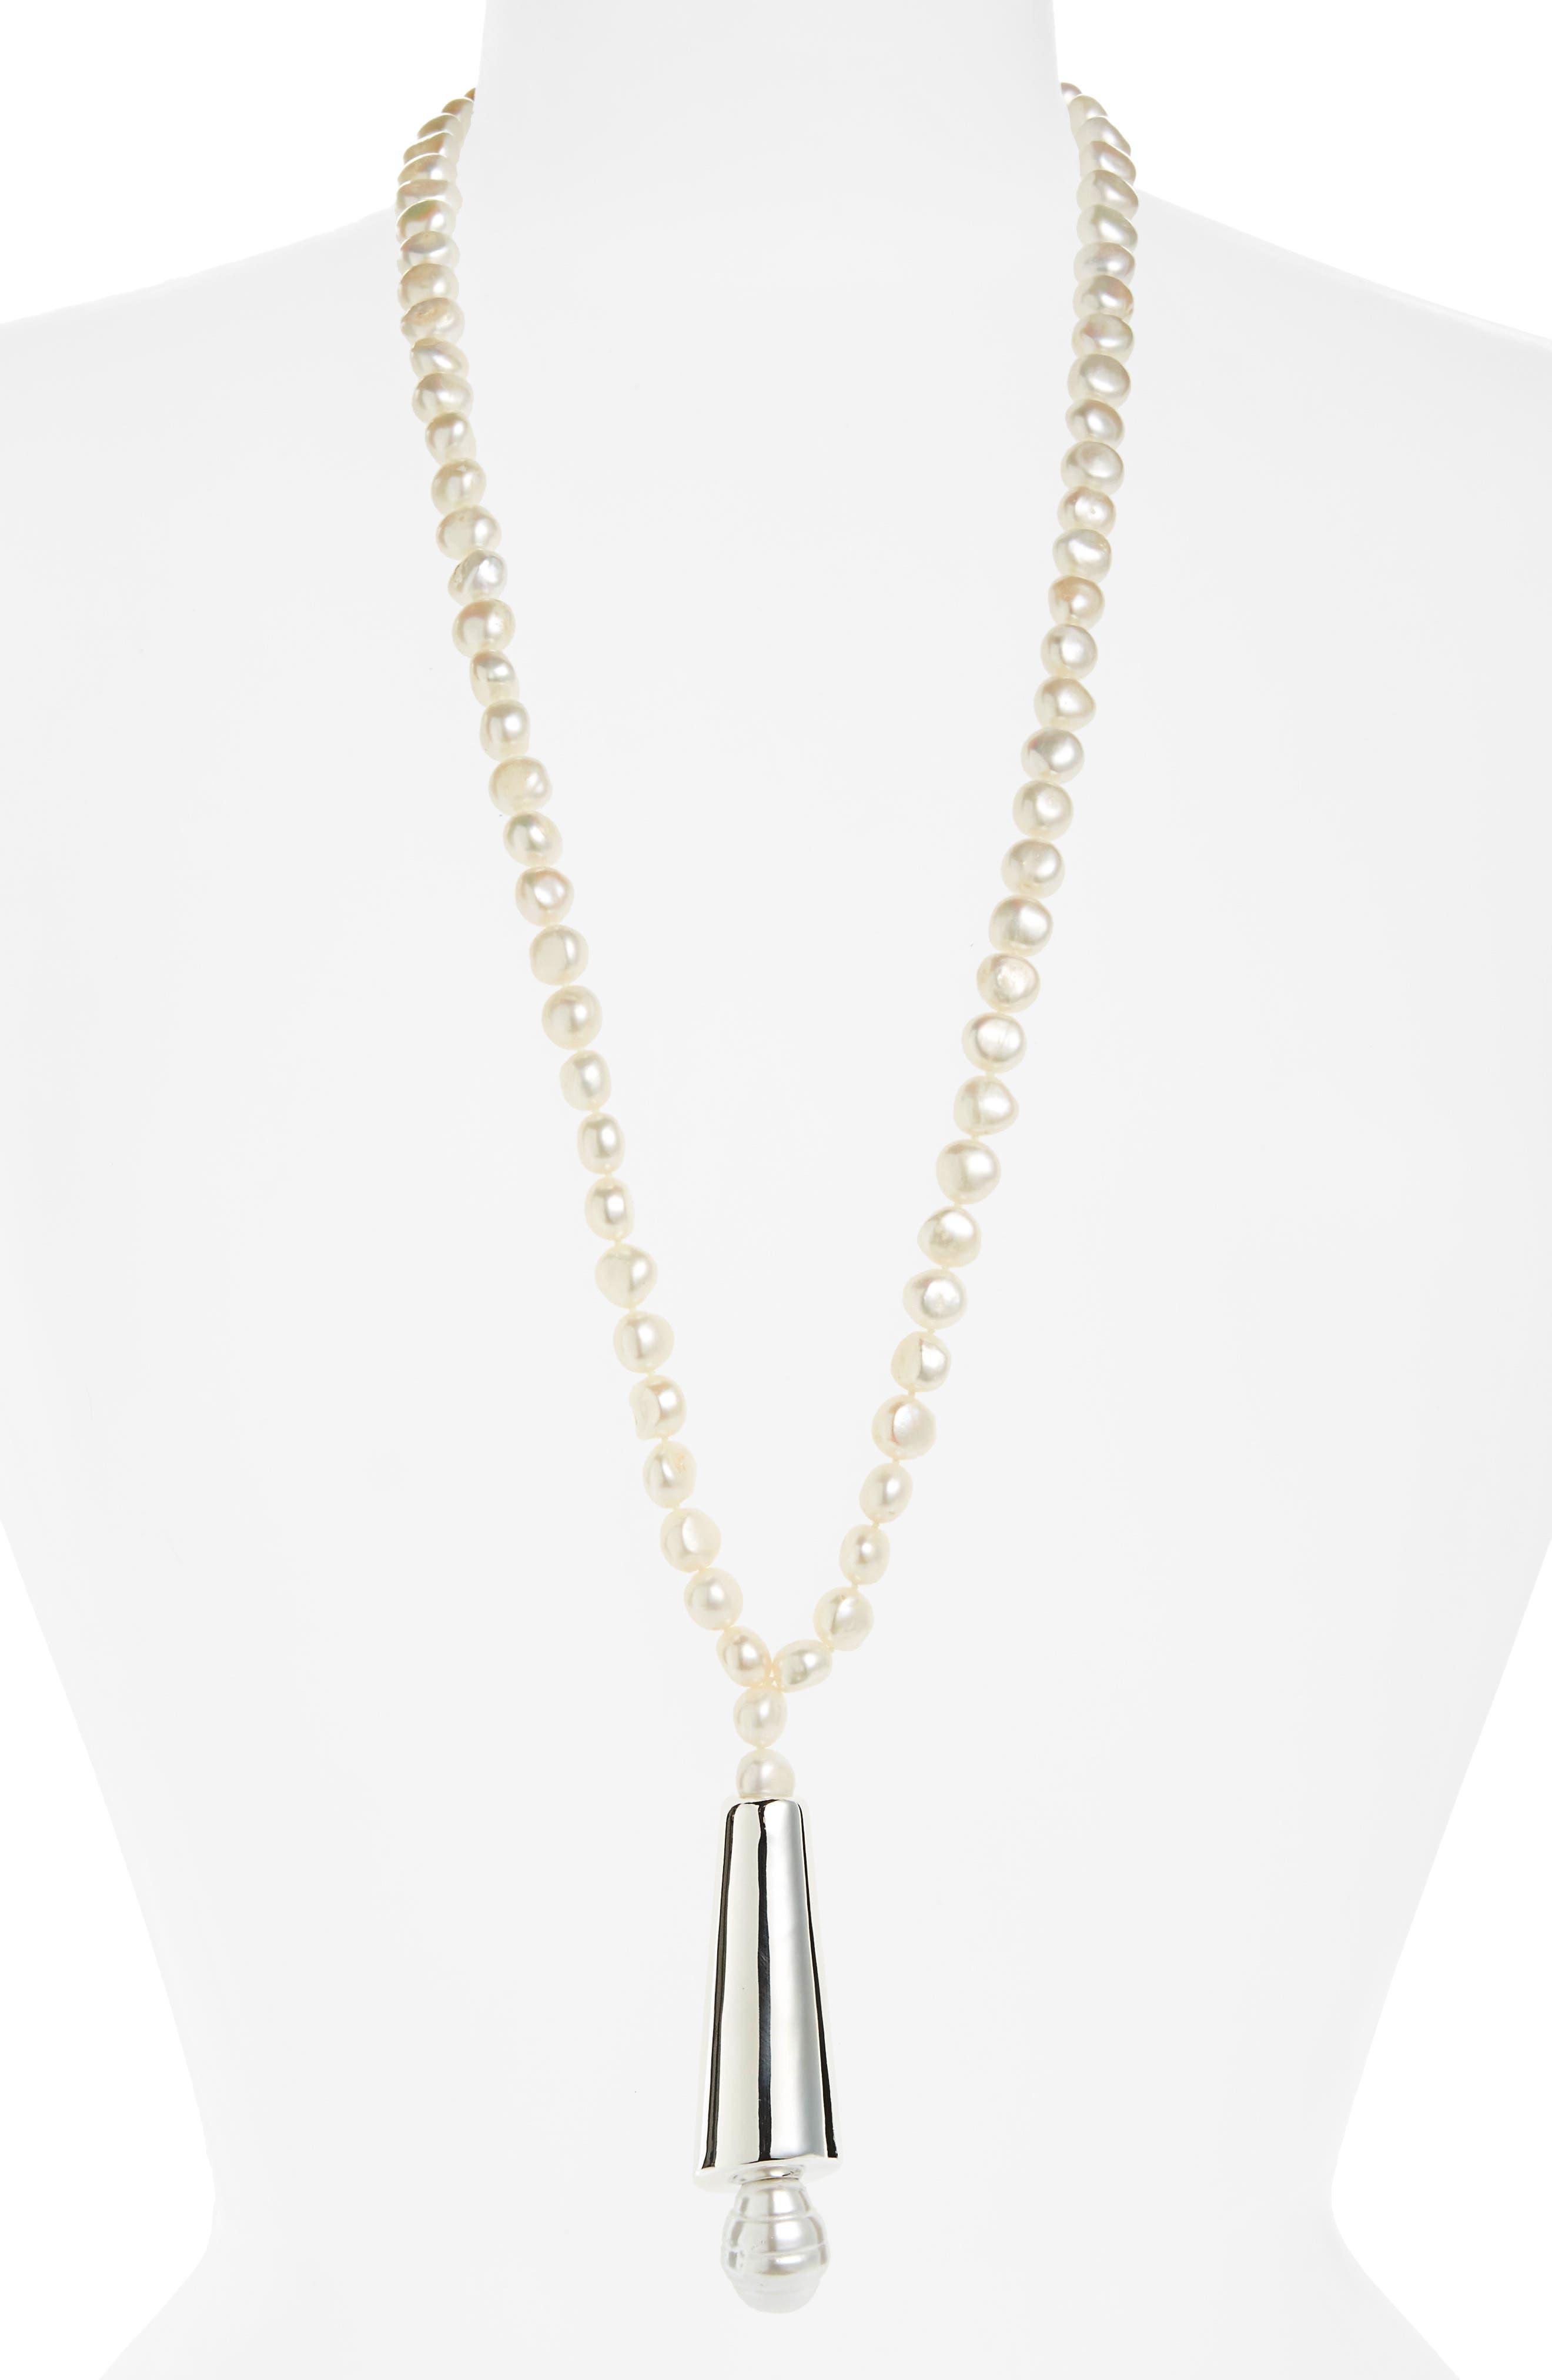 Semiprecious Stone Strand Necklace,                             Main thumbnail 1, color,                             040